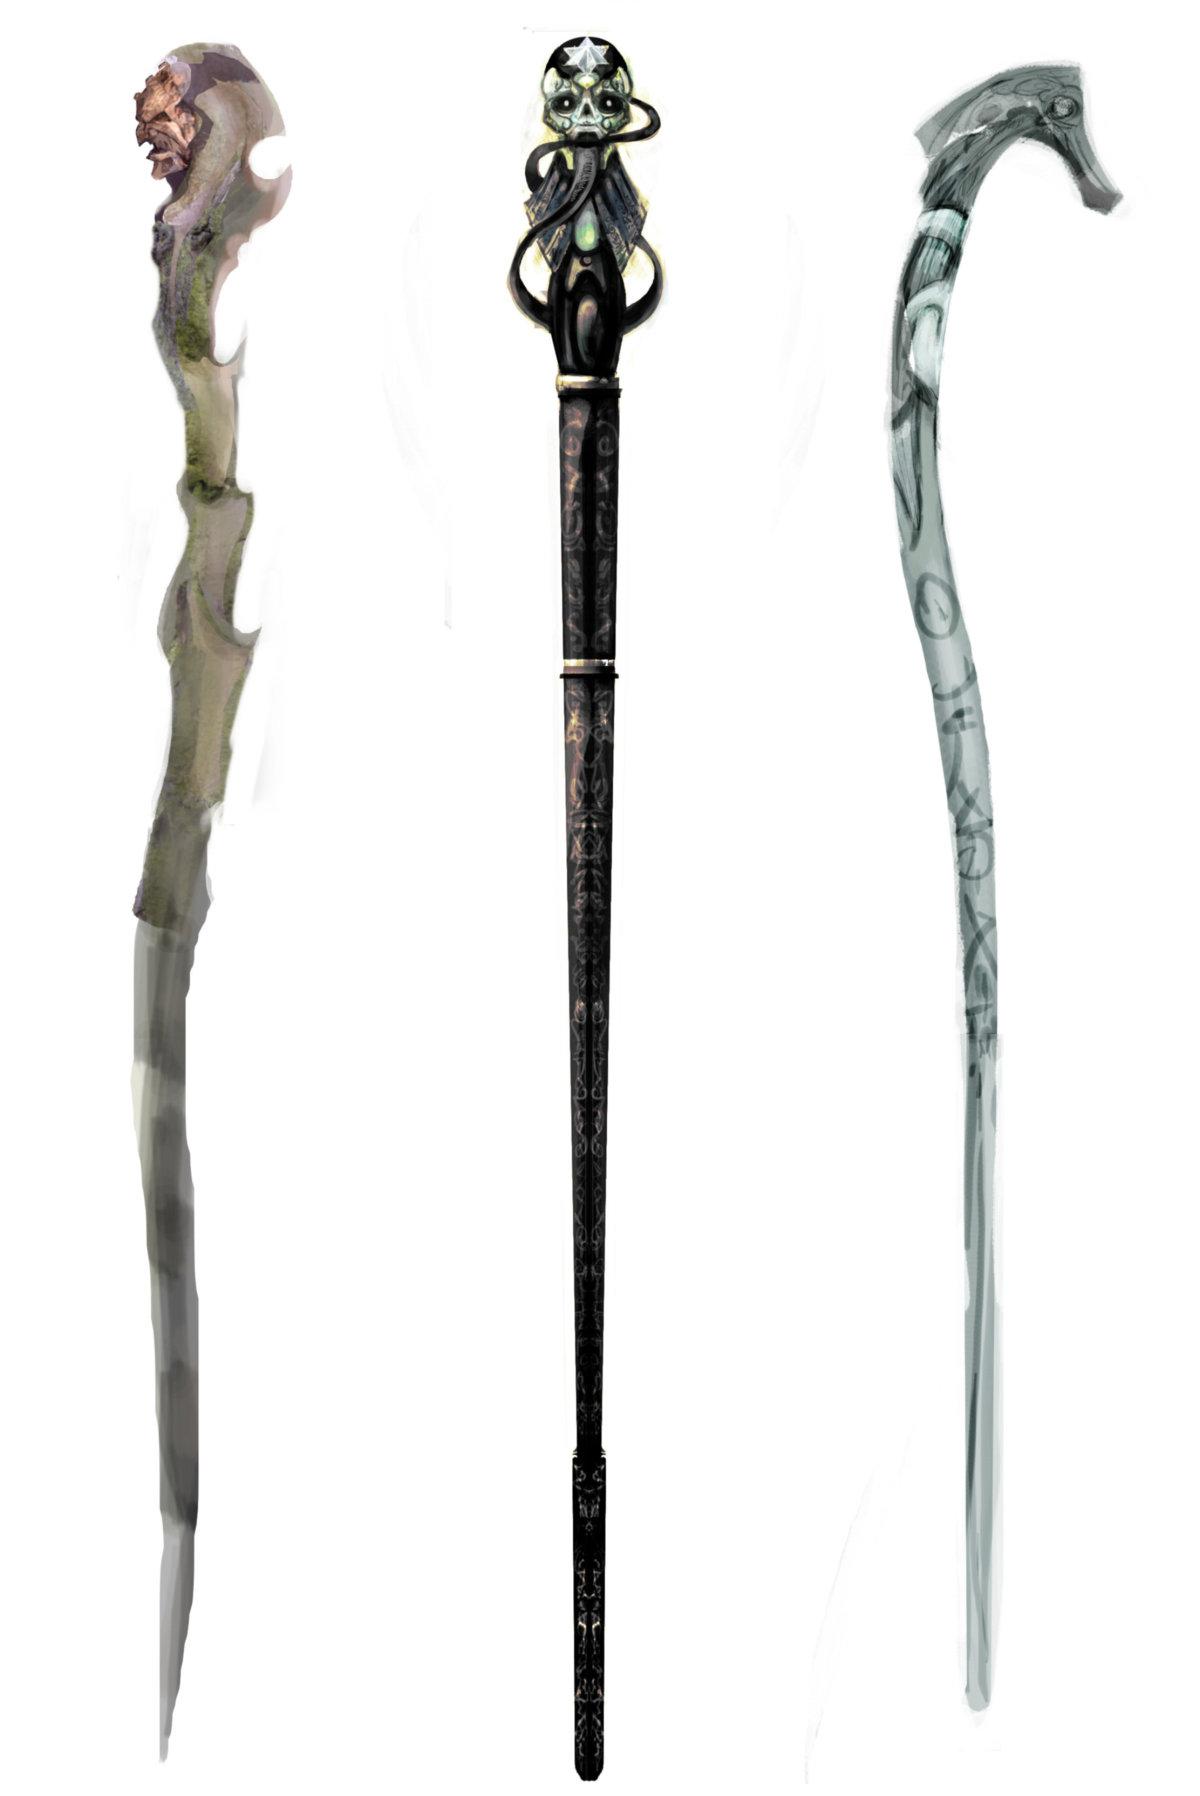 Dark magic wands - Pottermore